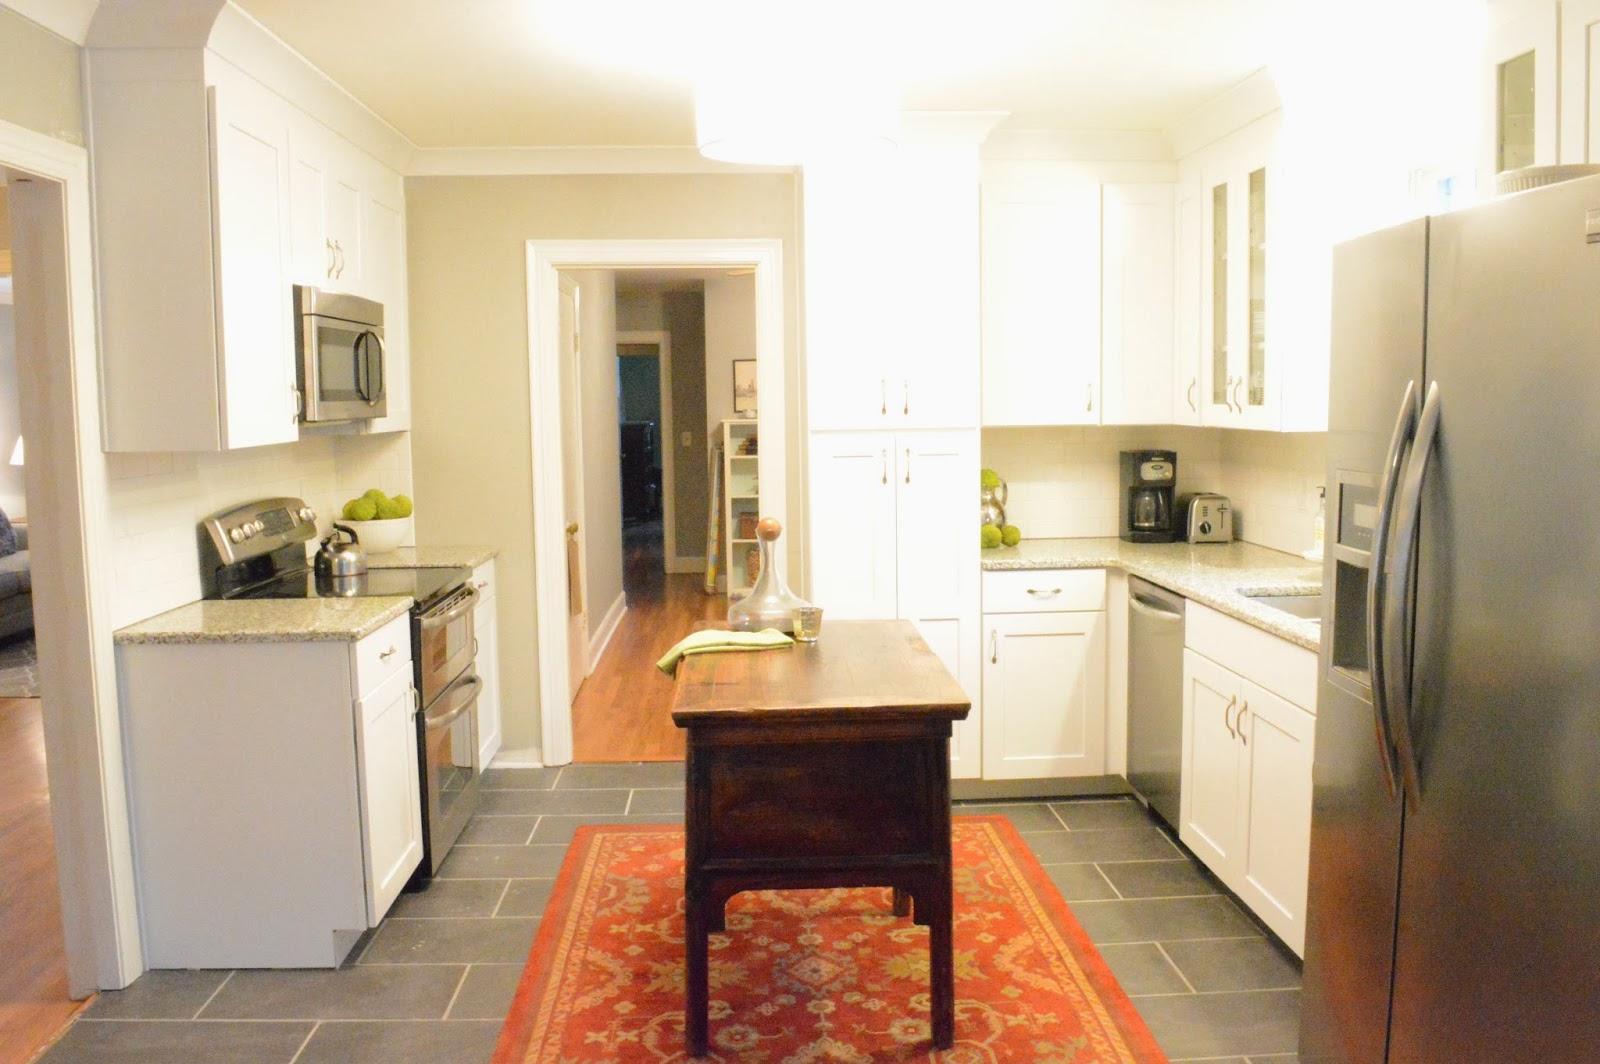 Sylvan Park Life Kitchen Renovation Budget Breakdown